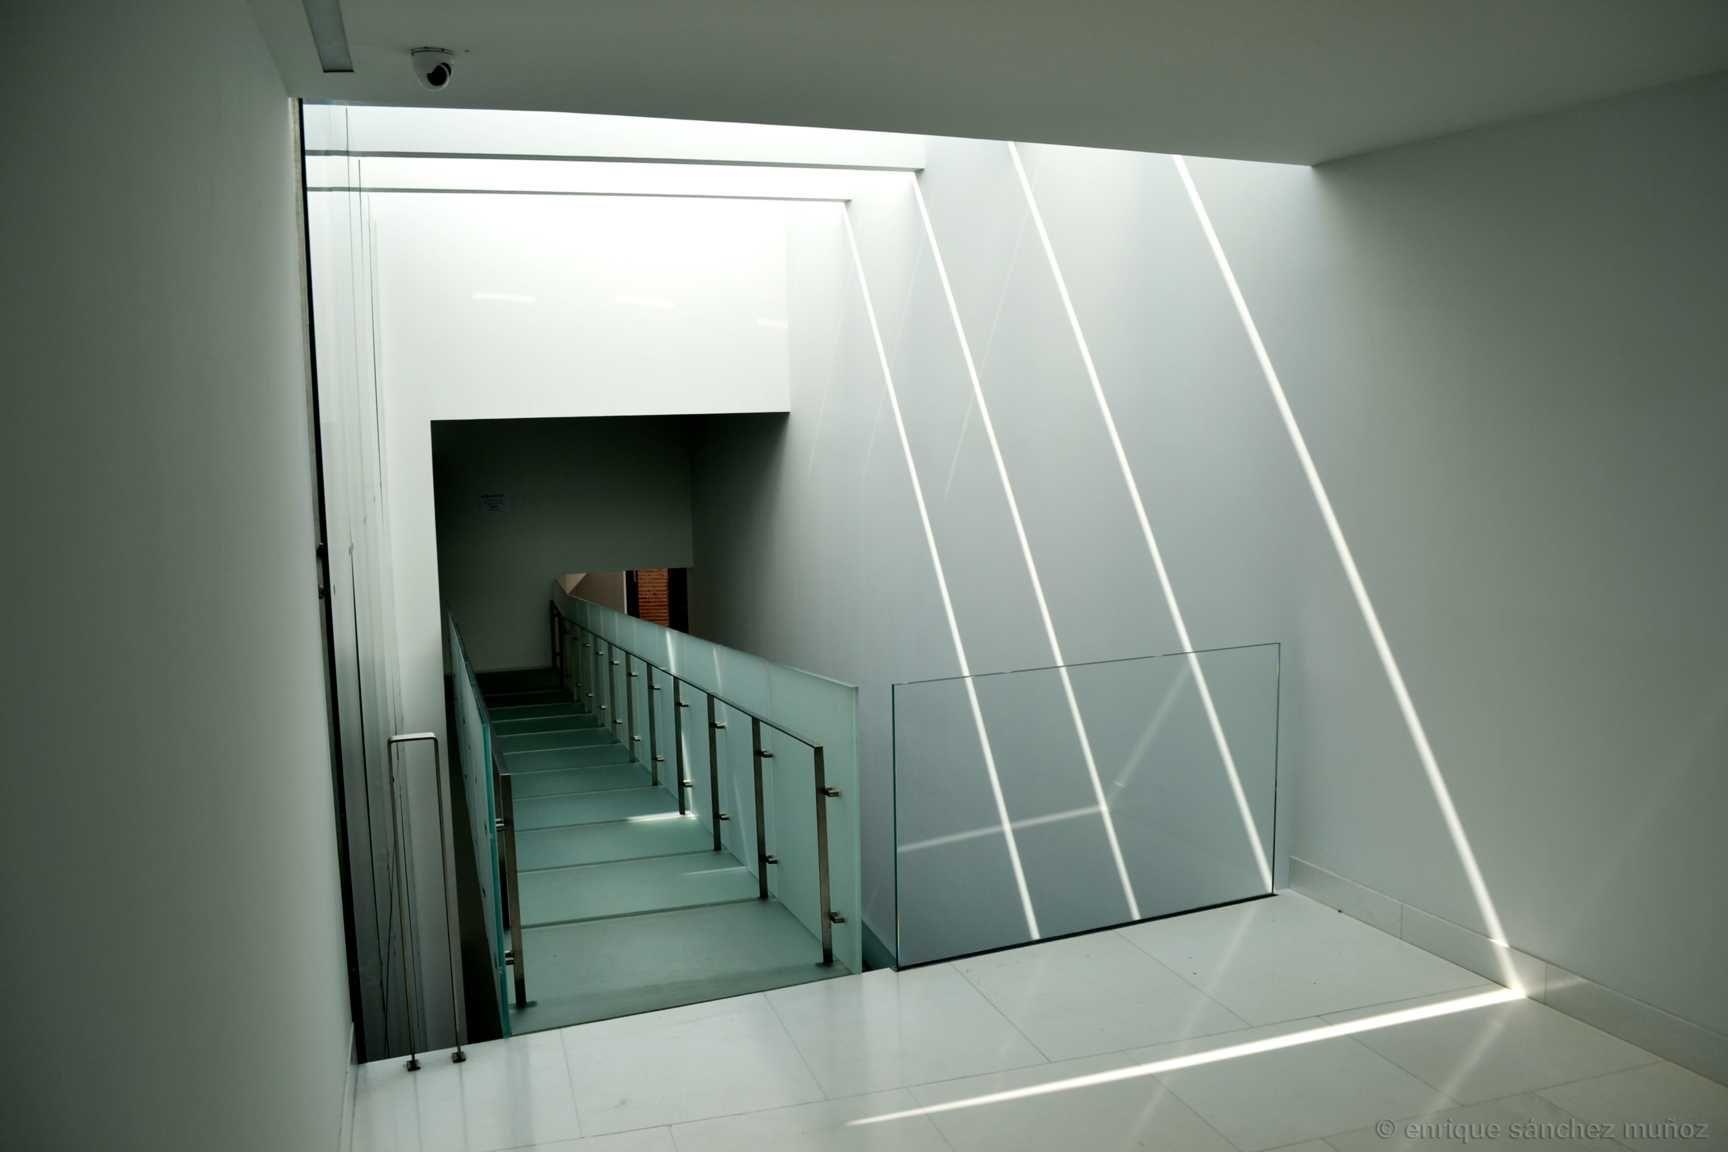 colegio de arquitectos de toledo spain arq antonio